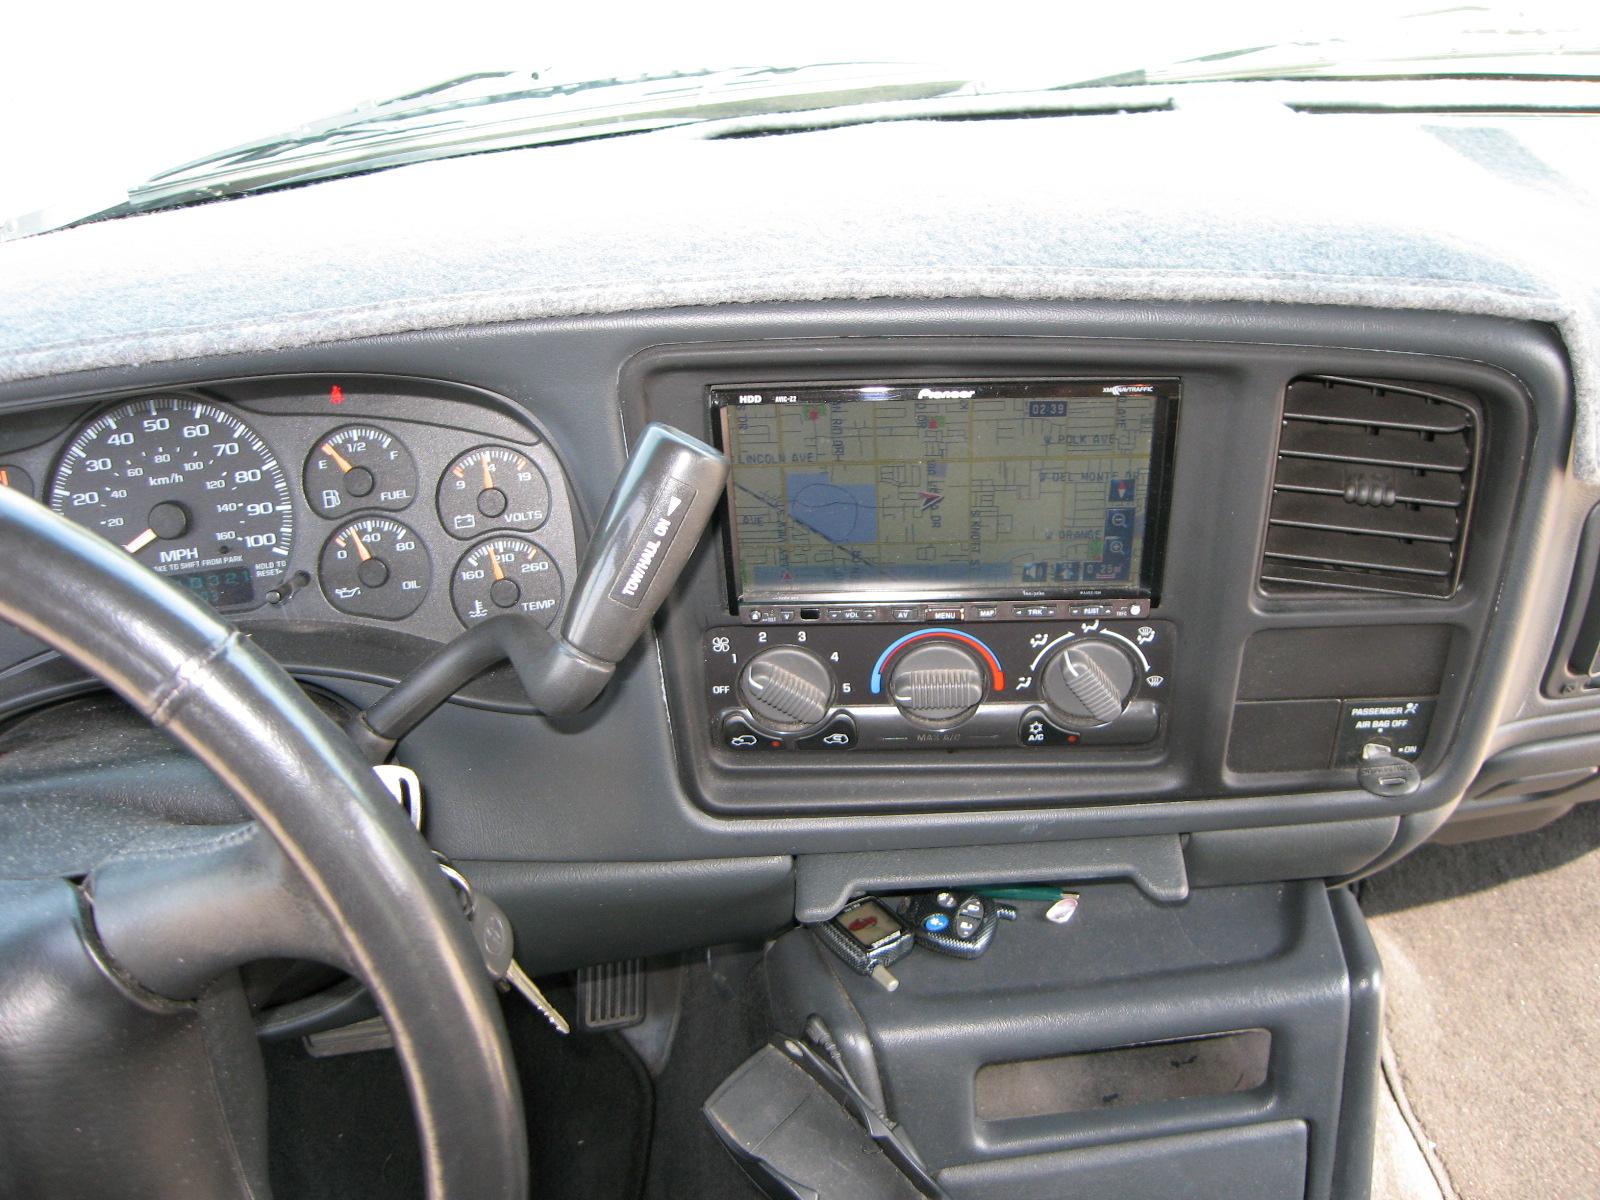 2001 Gmc Sierra 2500hd Pictures Cargurus